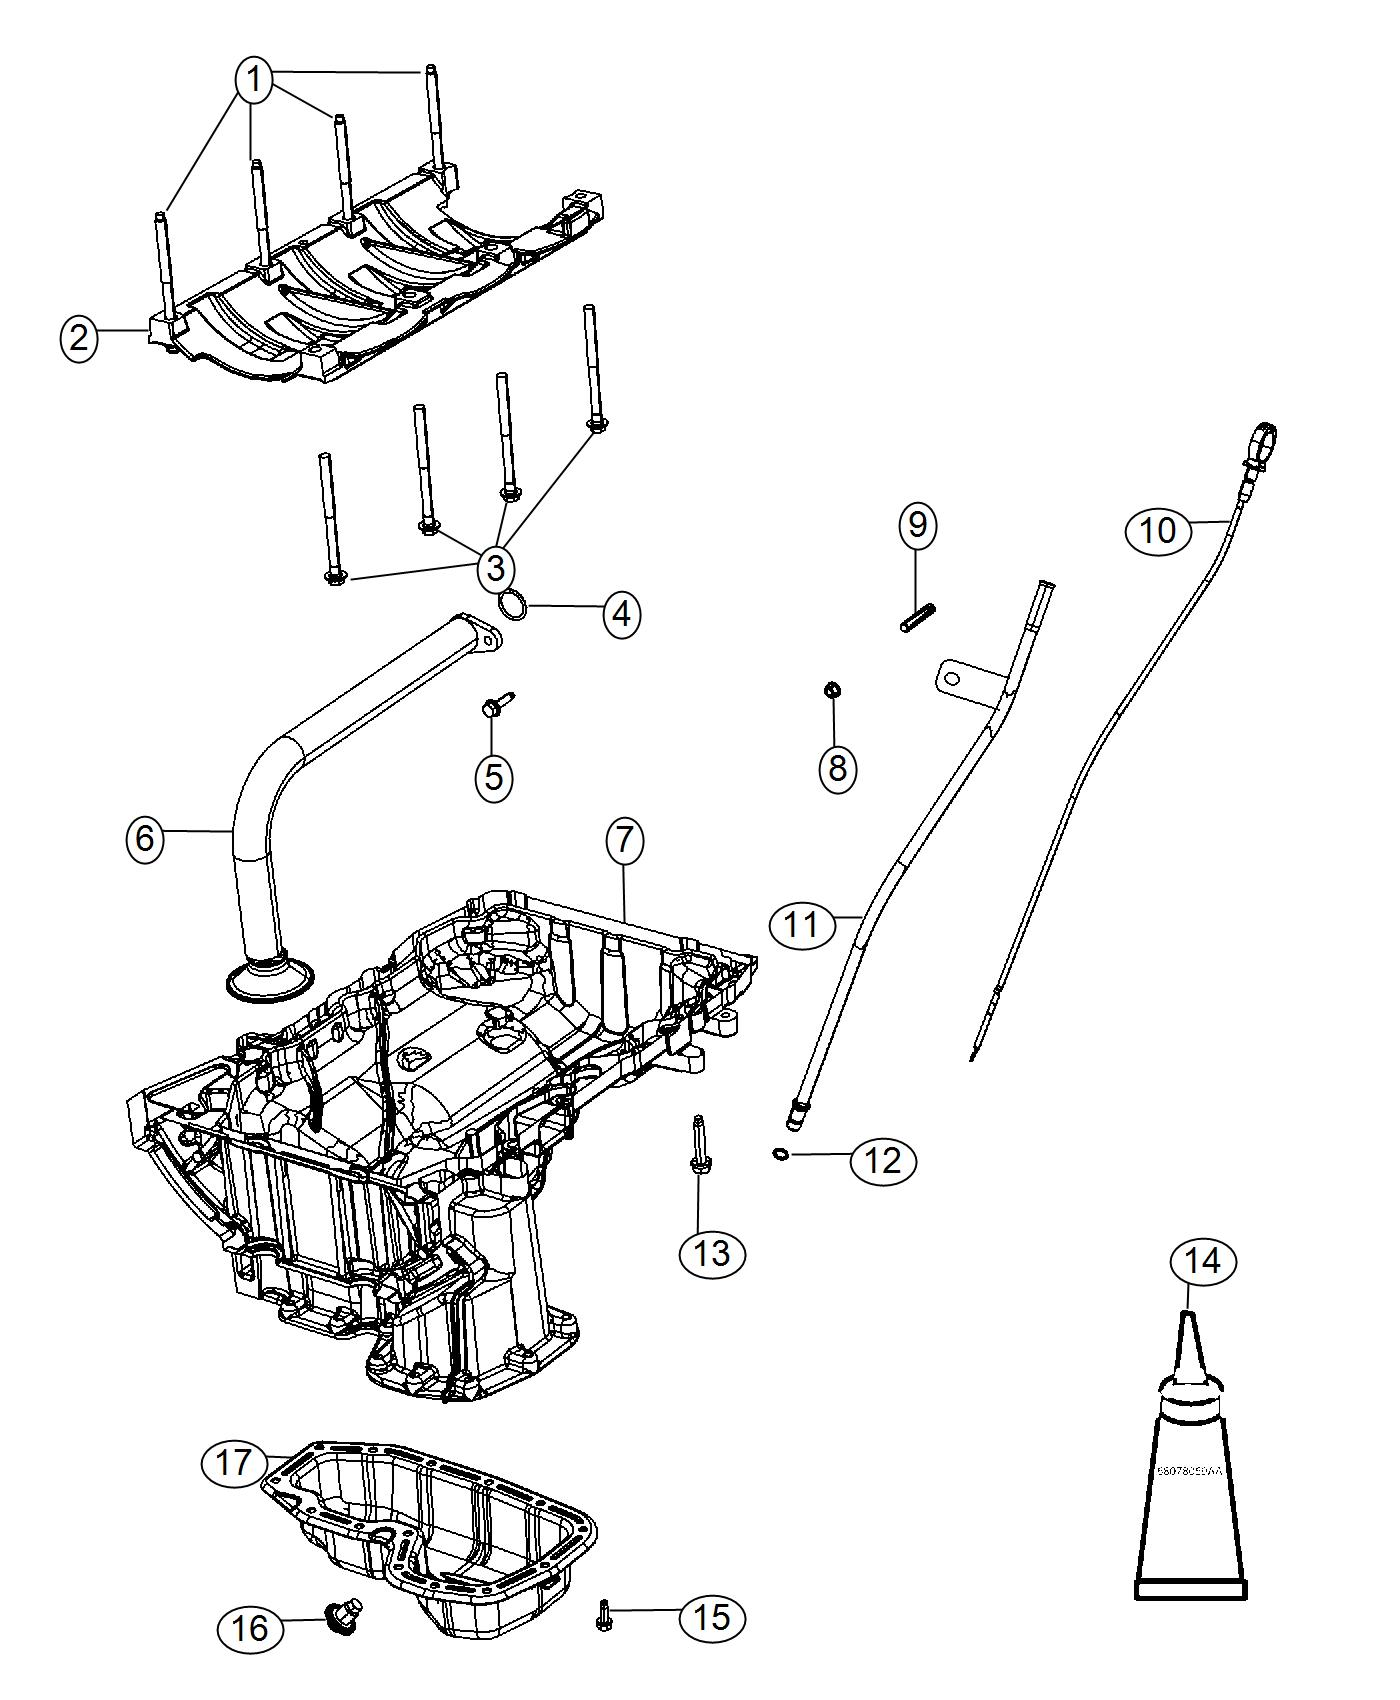 Jeep Grand Cherokee Pan. Oil. Upper. Engine, level